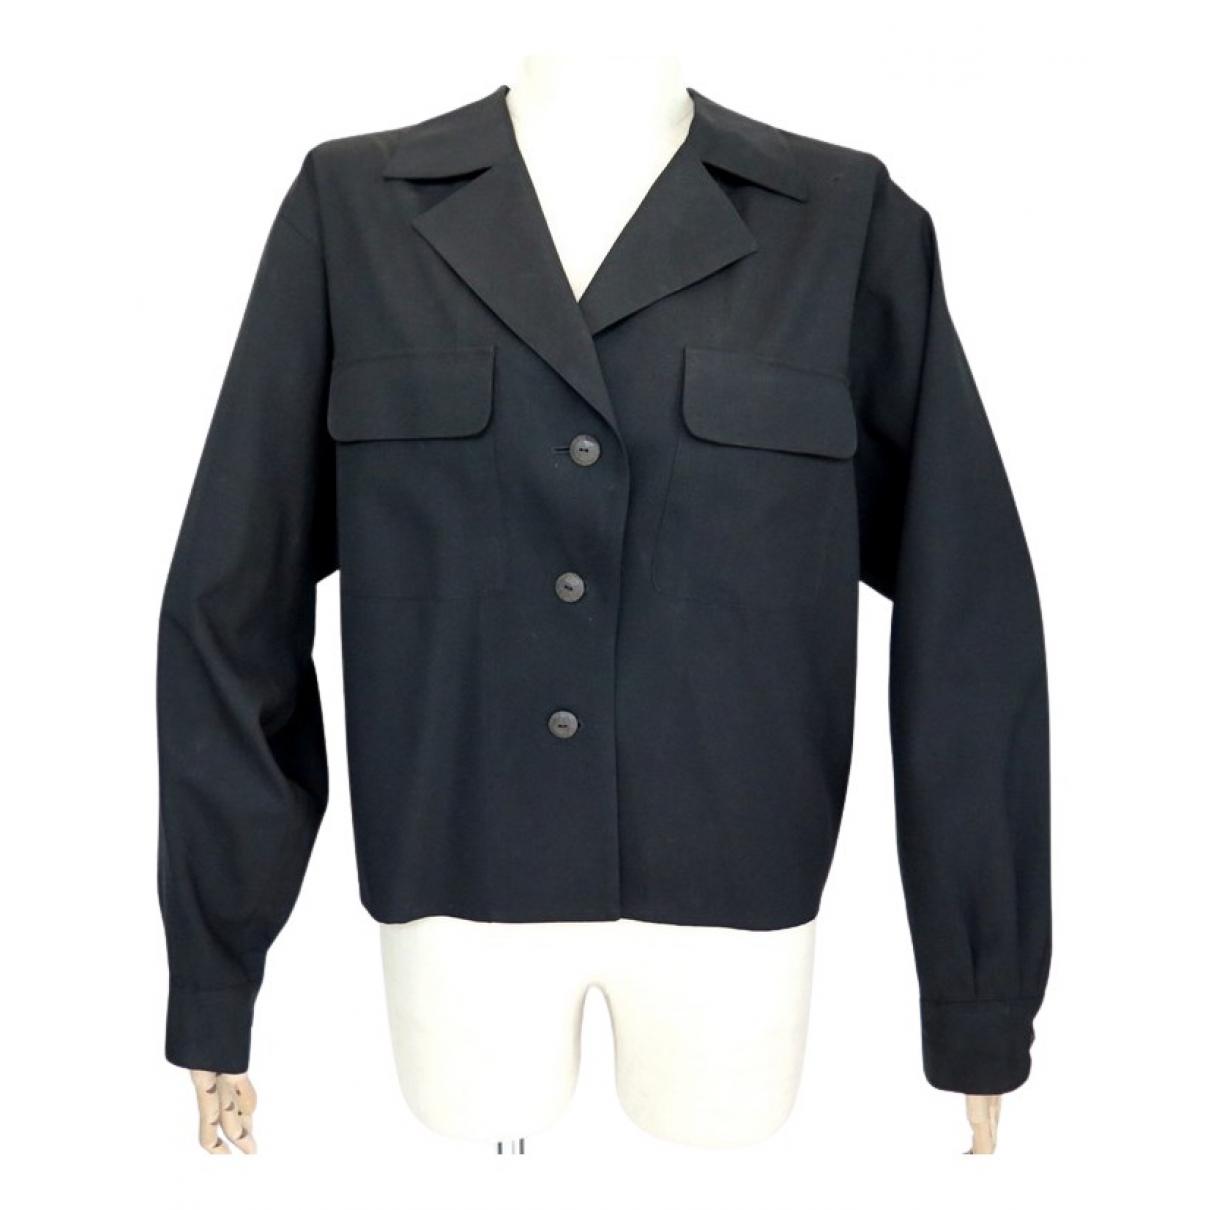 Yves Saint Laurent N Black Cotton jacket for Women M International